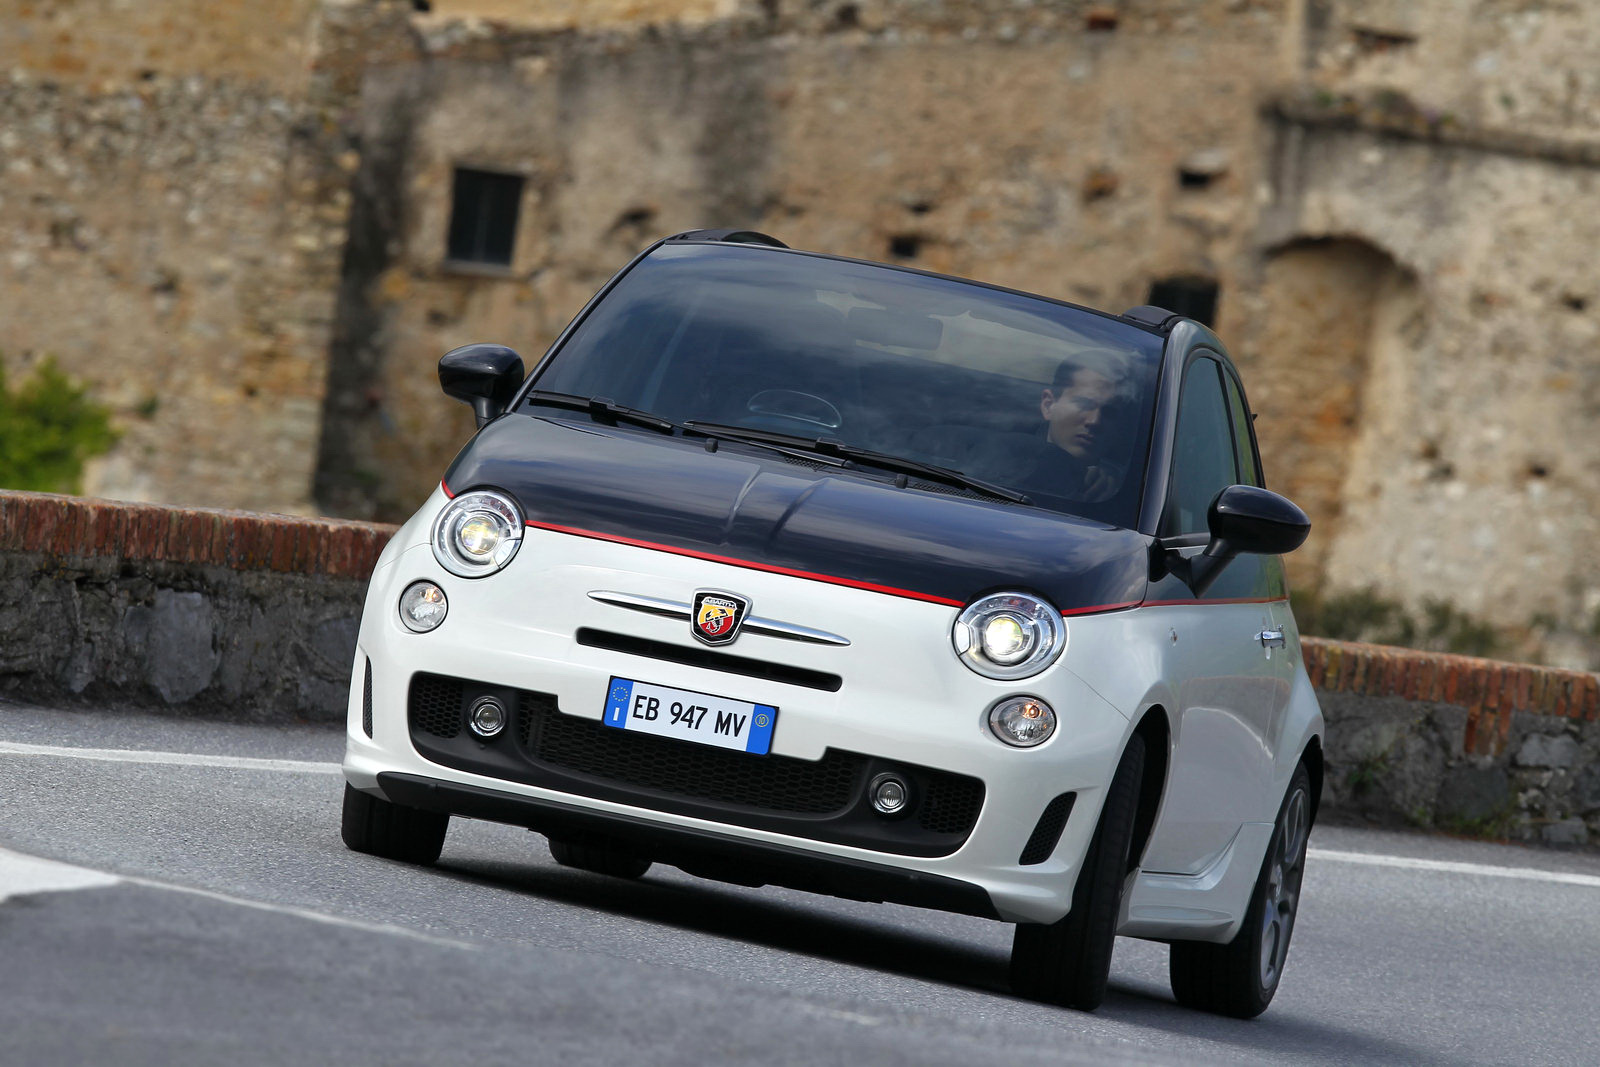 http://3.bp.blogspot.com/_FoXyvaPSnVk/TBfMj626BqI/AAAAAAAC9ww/o-wuMUJraQA/s1600/Fiat-Abarth-500C-40.jpg